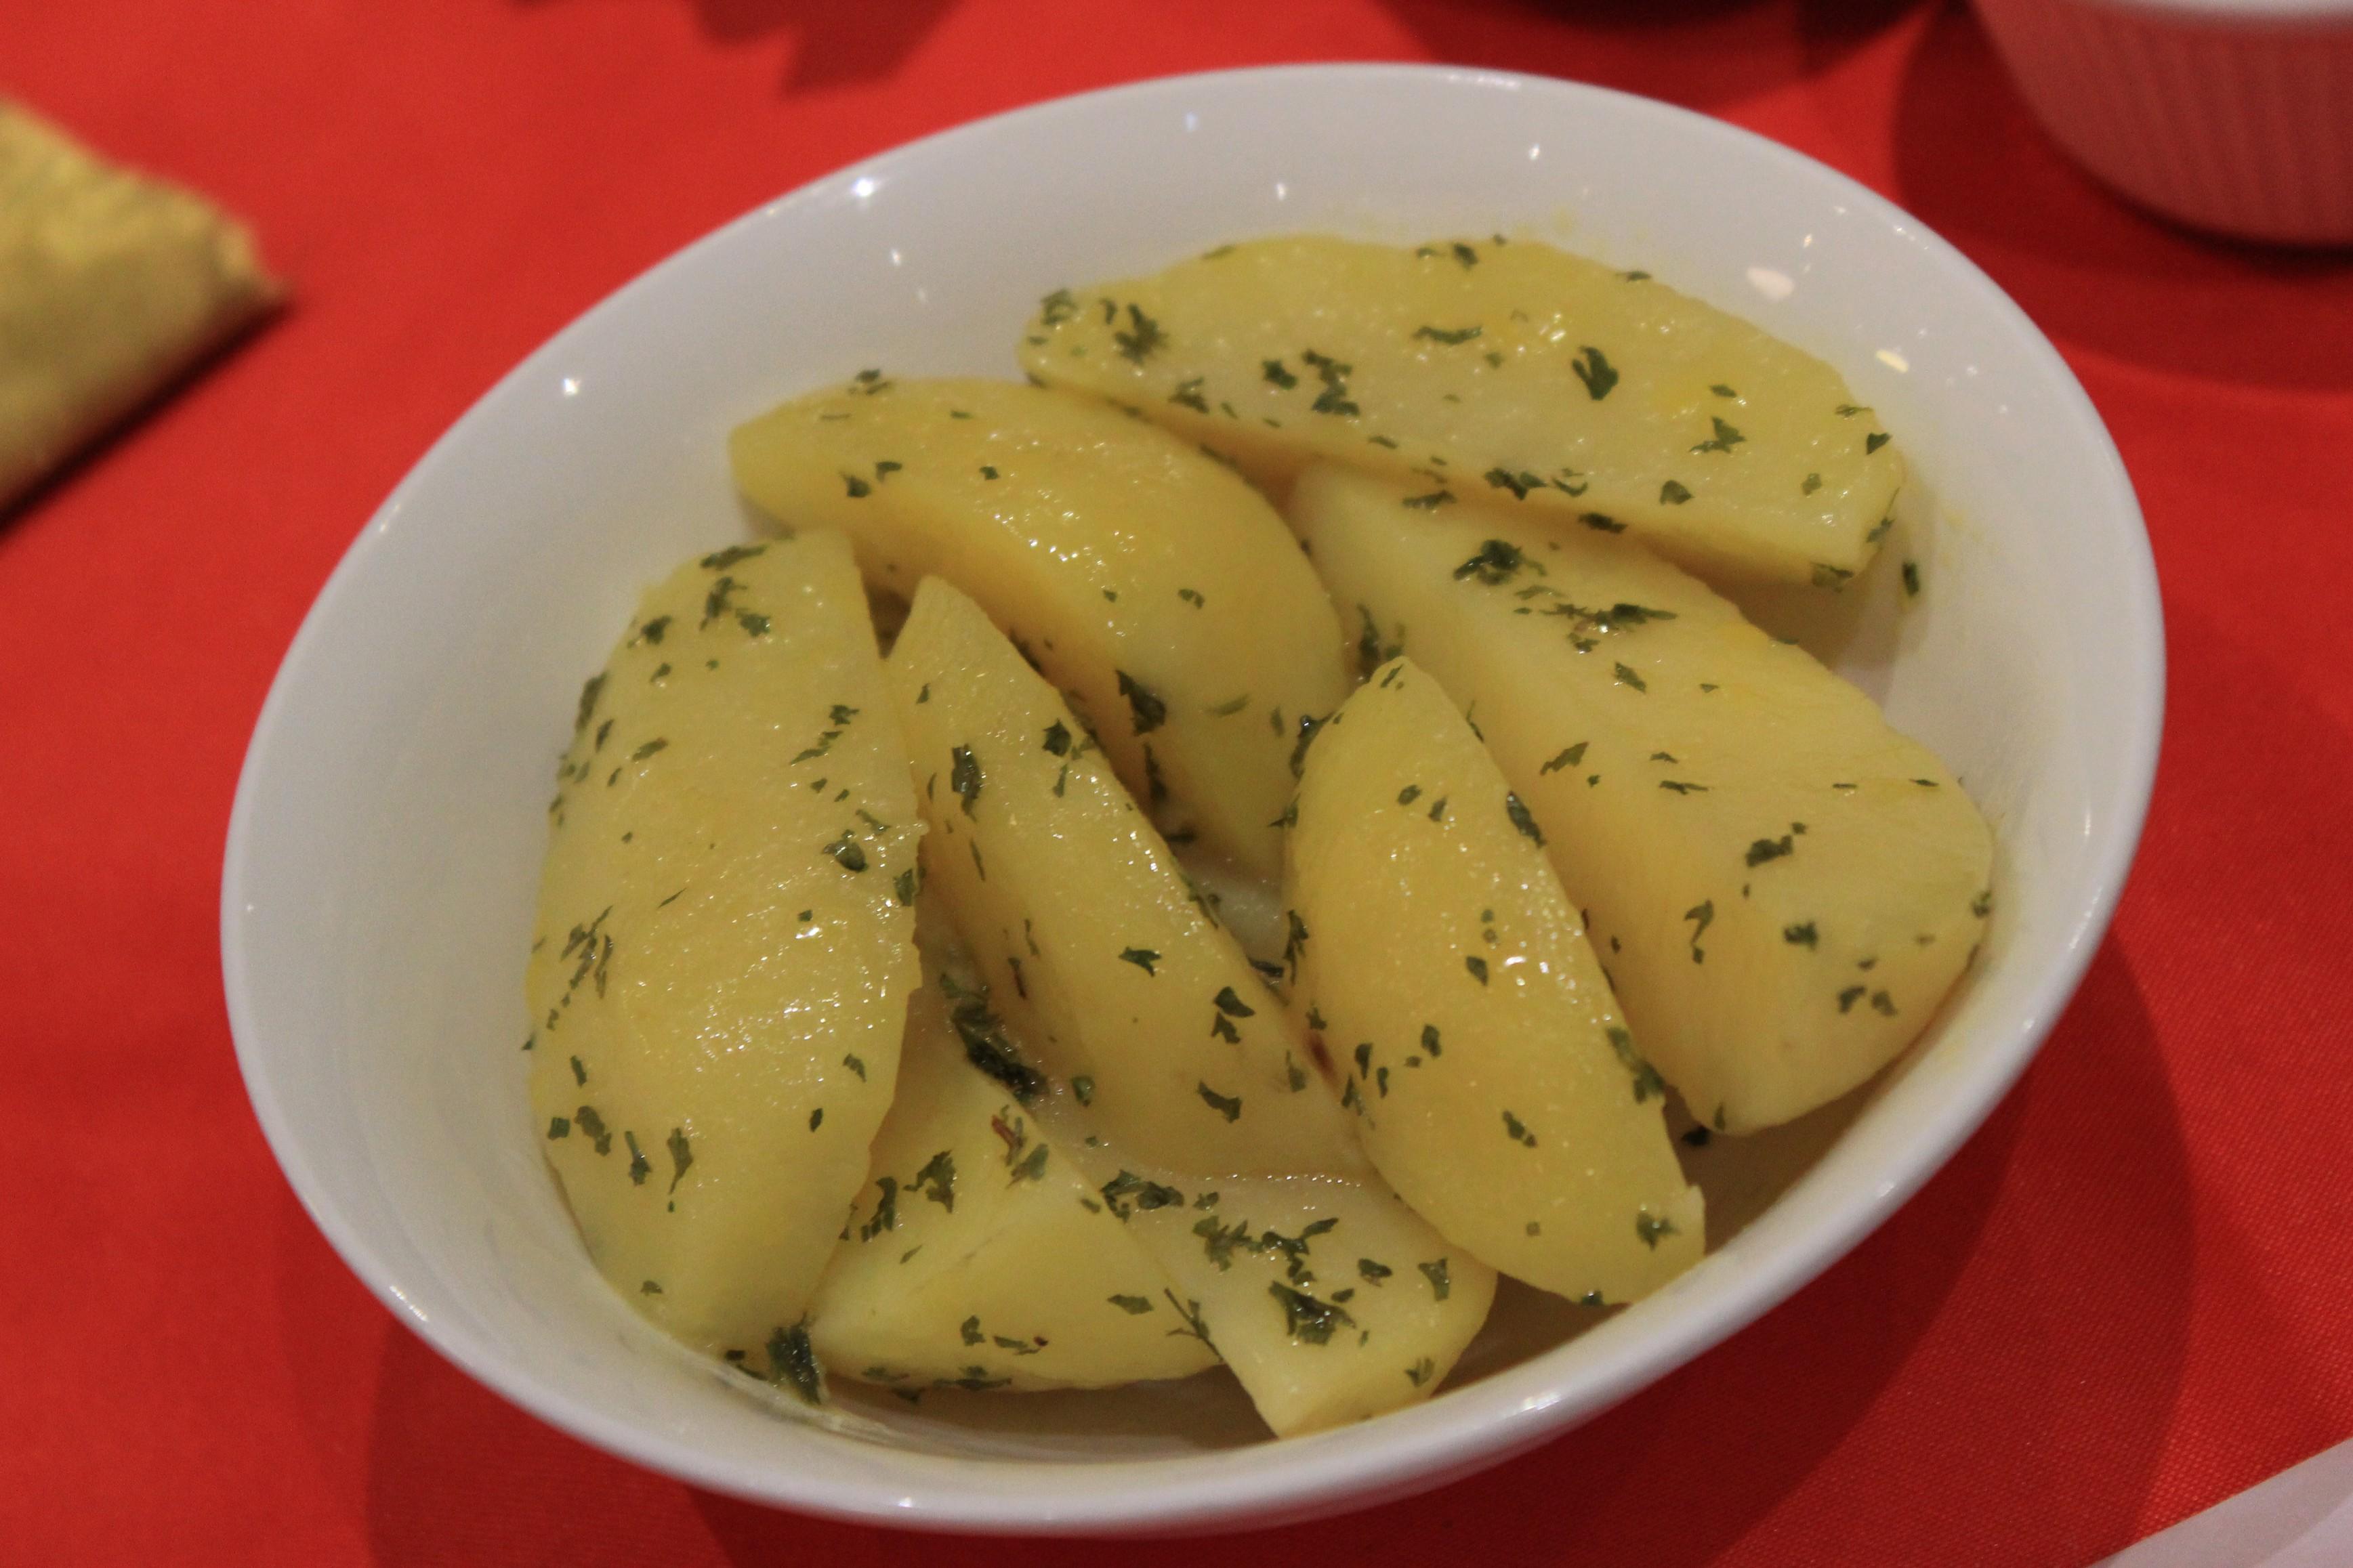 Garlic Parsley Potato